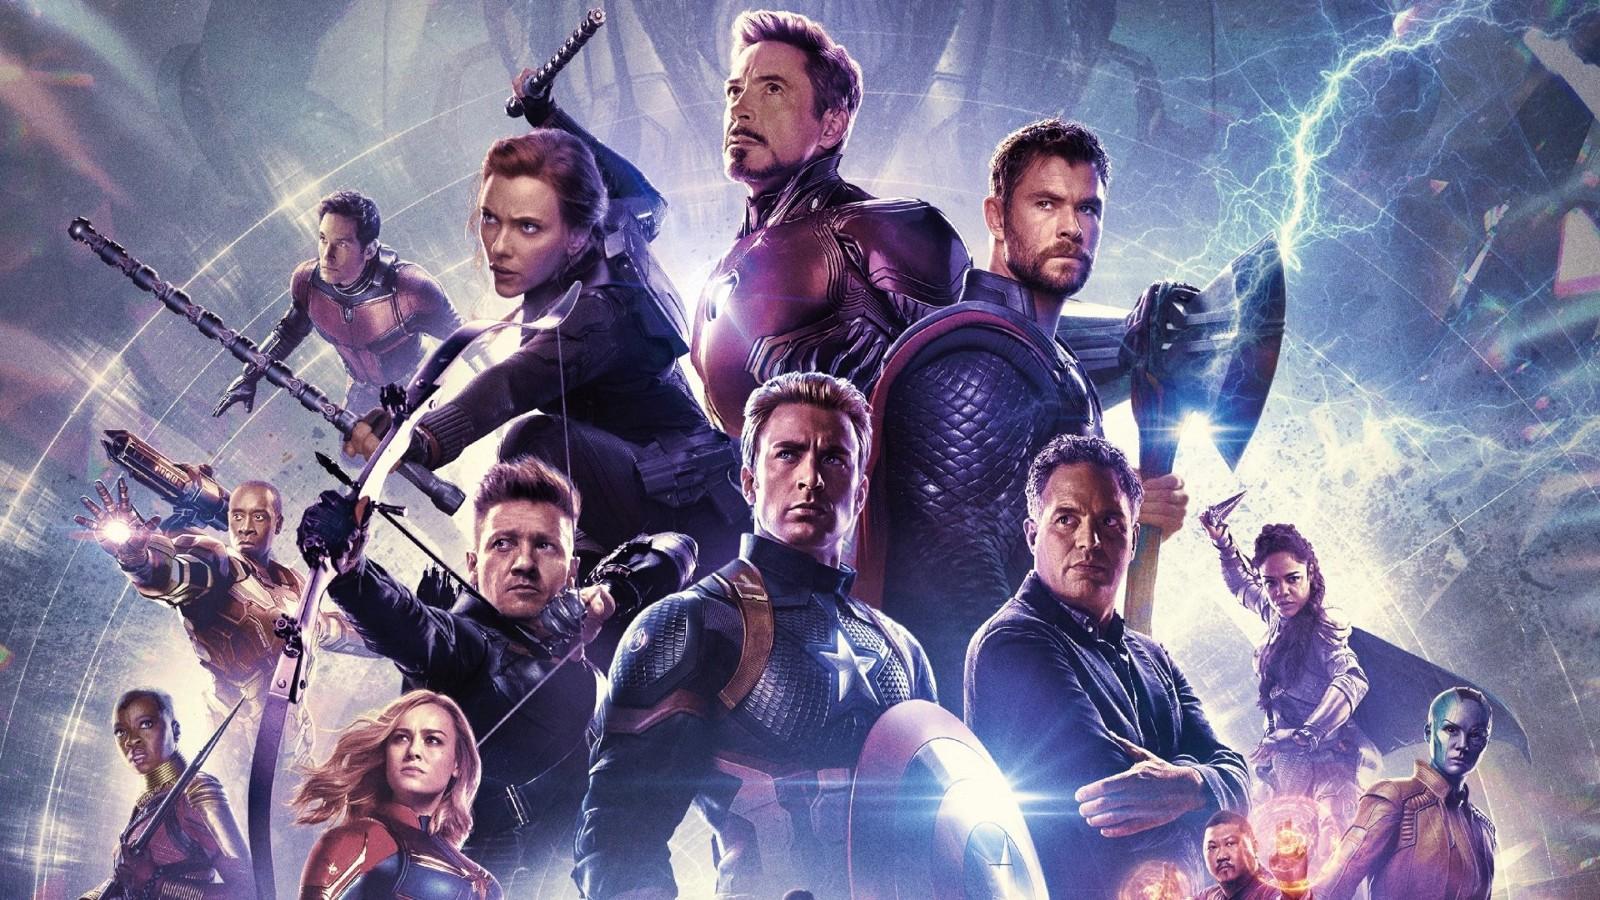 James Cameron felicita a Avengers: Endgame por 'hundir' su Titanic taquillero